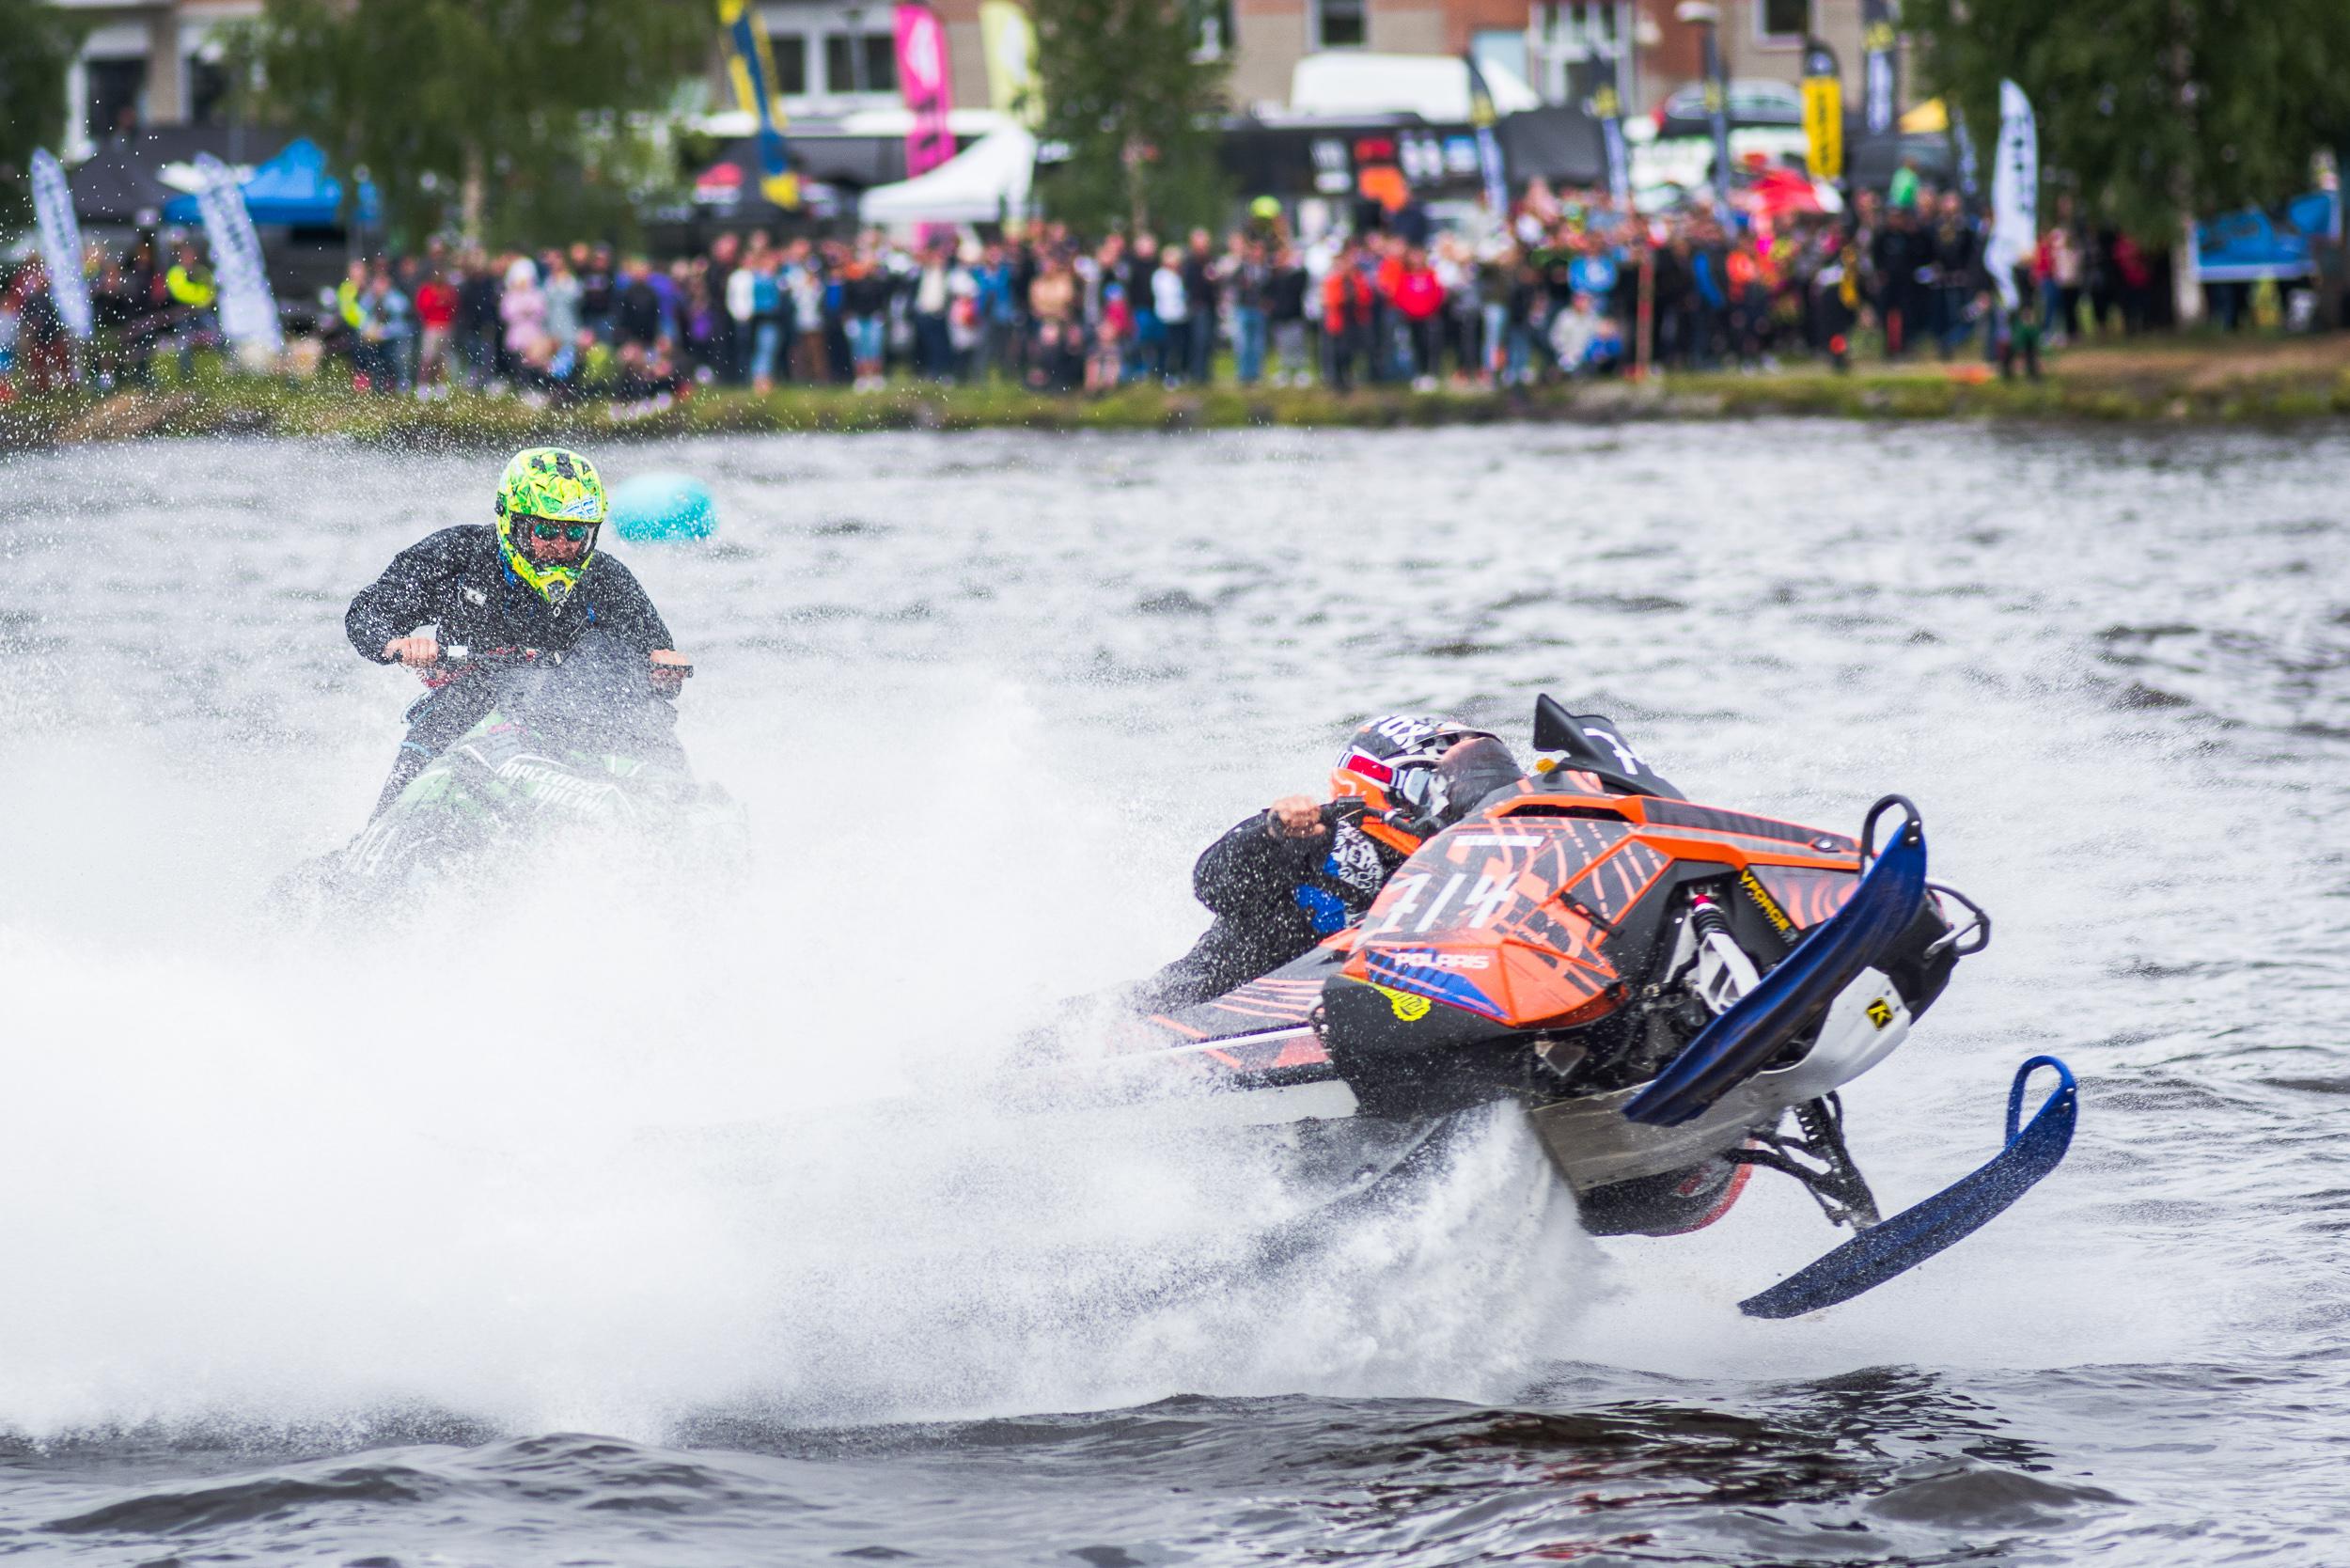 Boden Alive Water X European Watercross Championship 2017